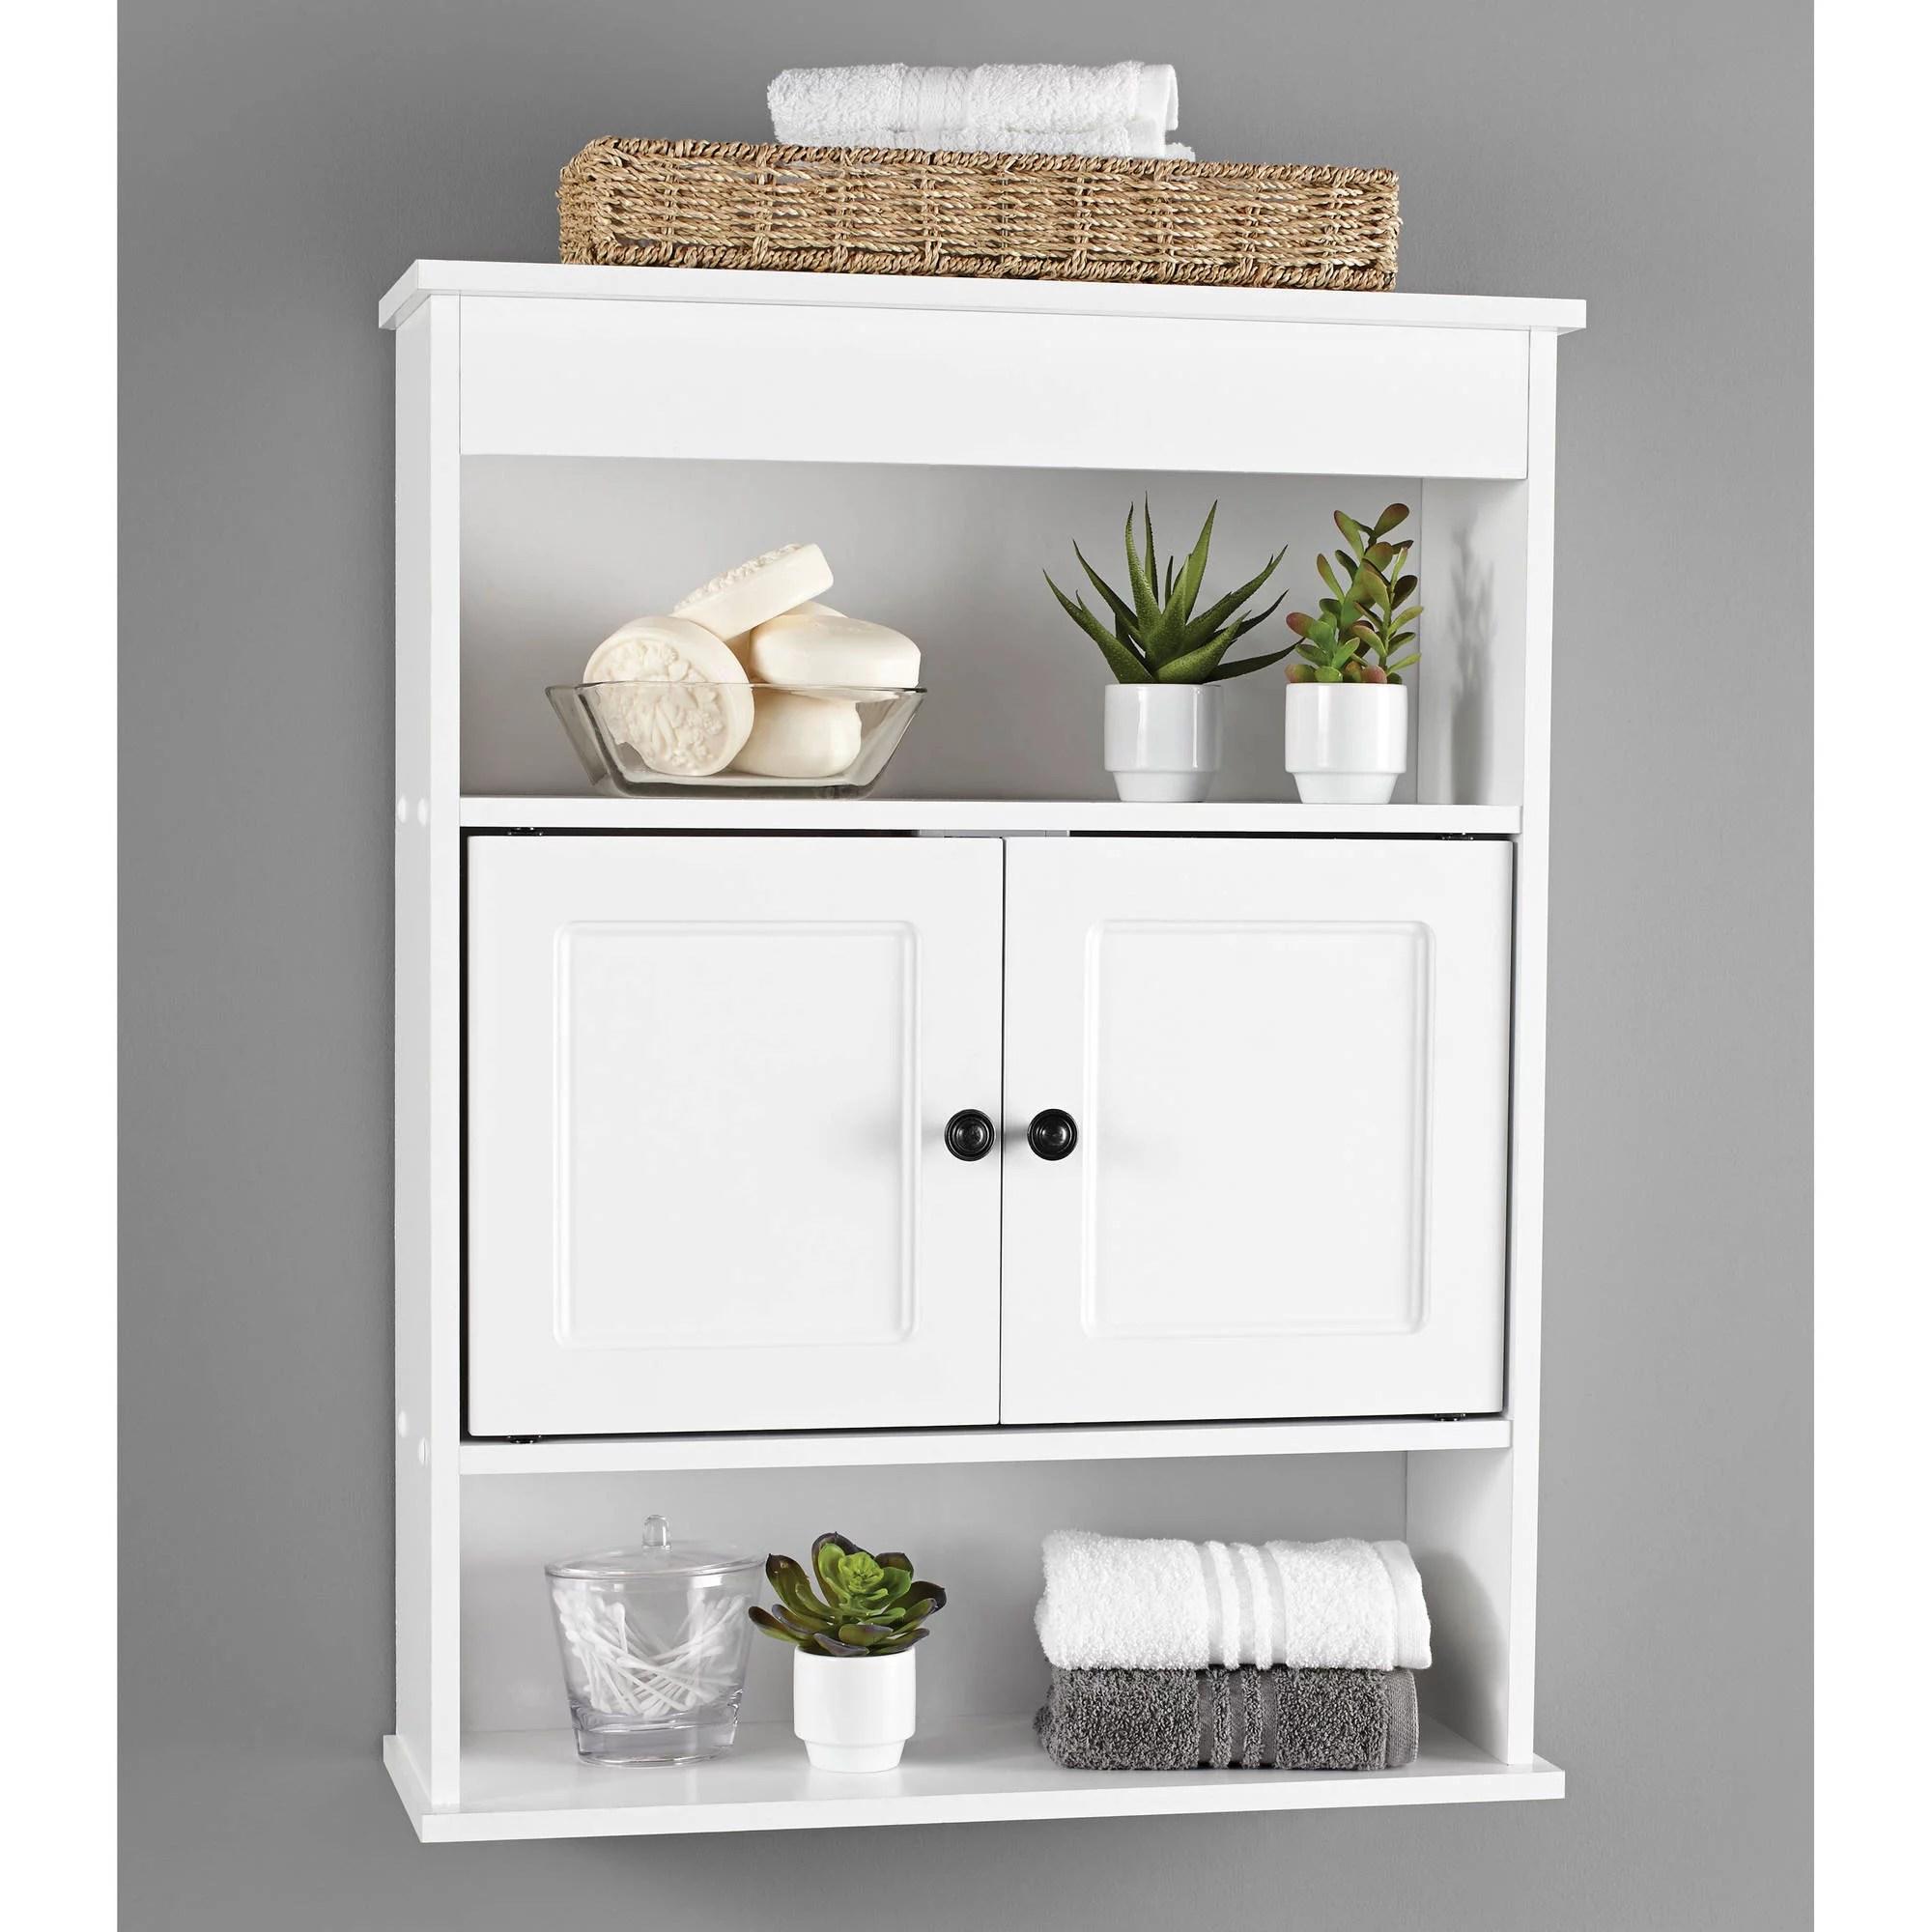 Cabinet Wall Bathroom Storage White Shelf Organizer Over Toilet Mount Towel Bath 43197154934  eBay